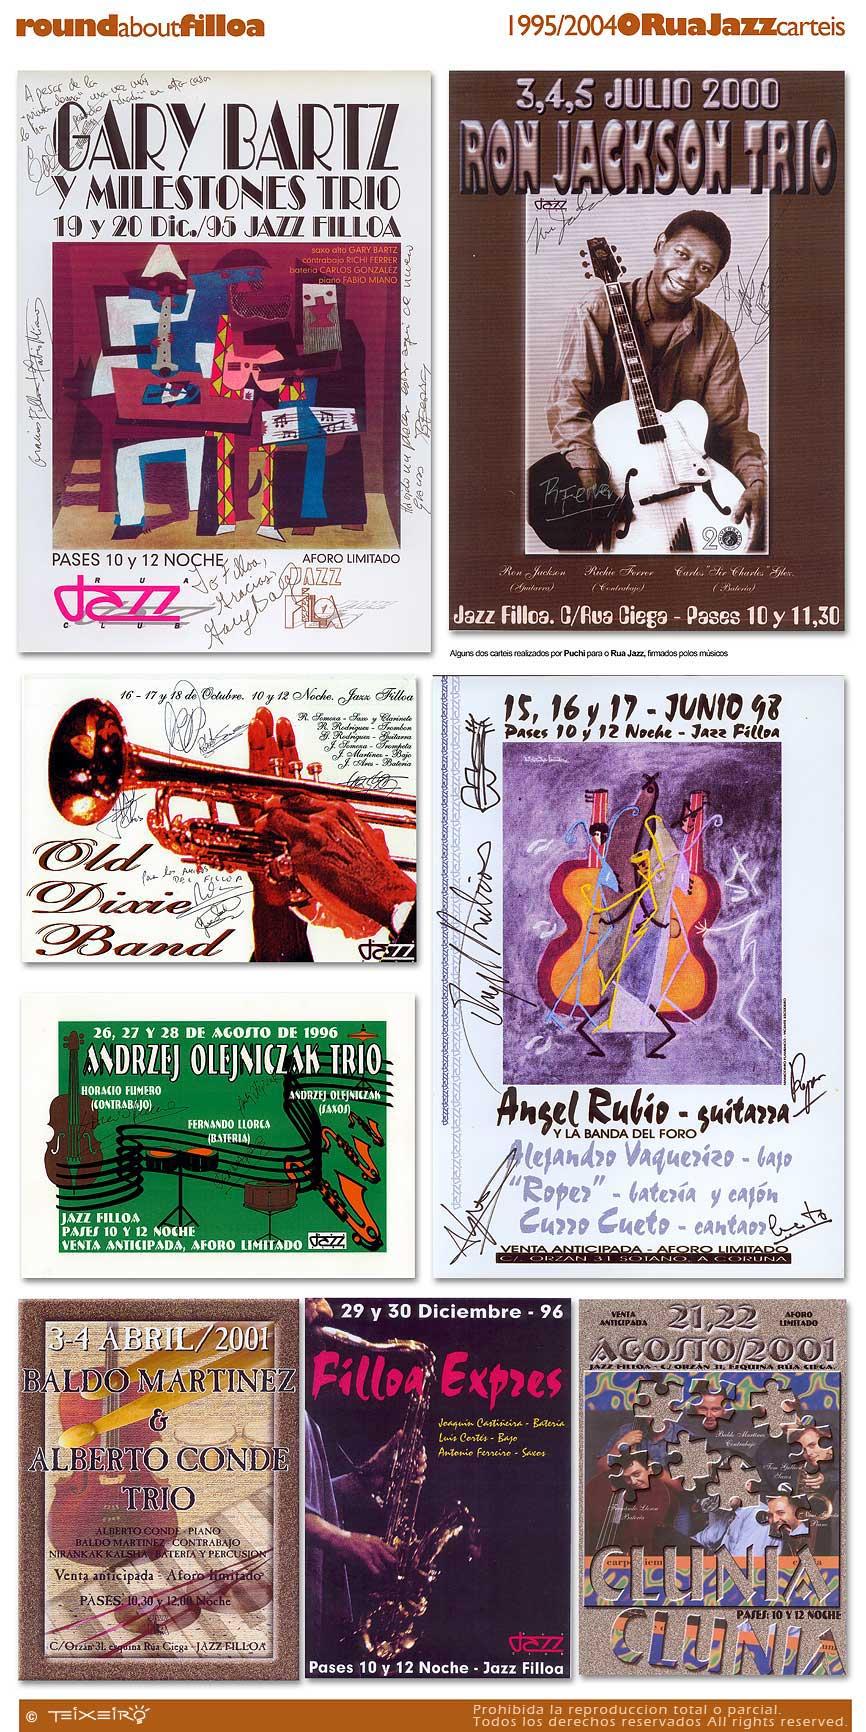 Doble Sesion: Don Pullen (Random Thoughts) & Don Byas Quartet feat. Sir Charles Thompson Rua08carteles2